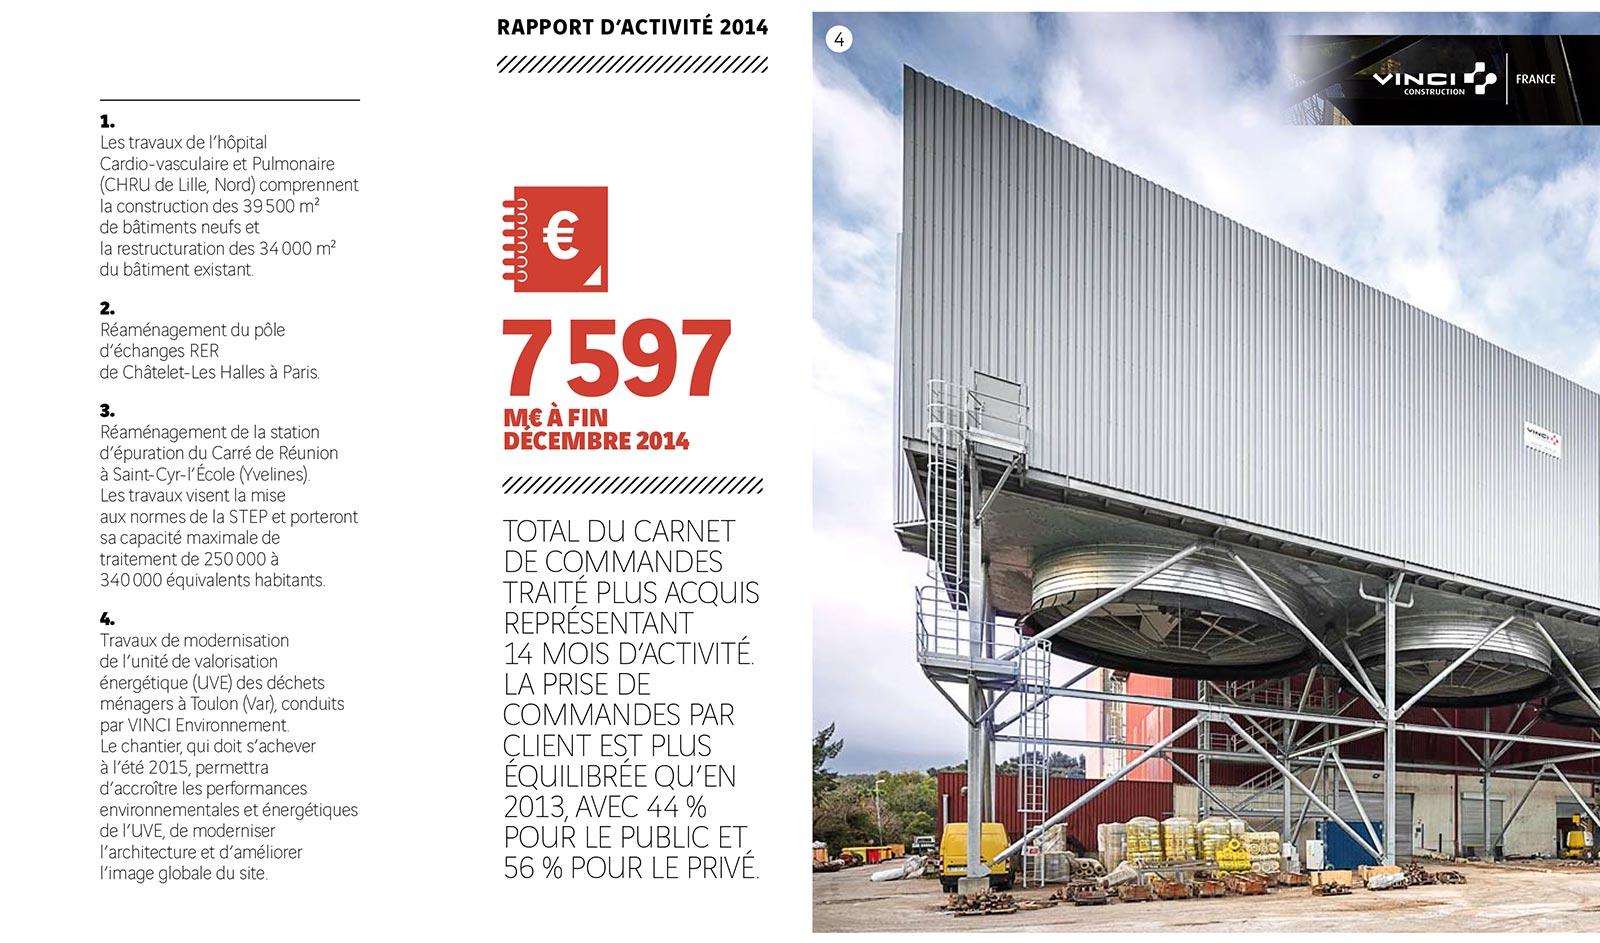 RA 2014 VINCI Construction France